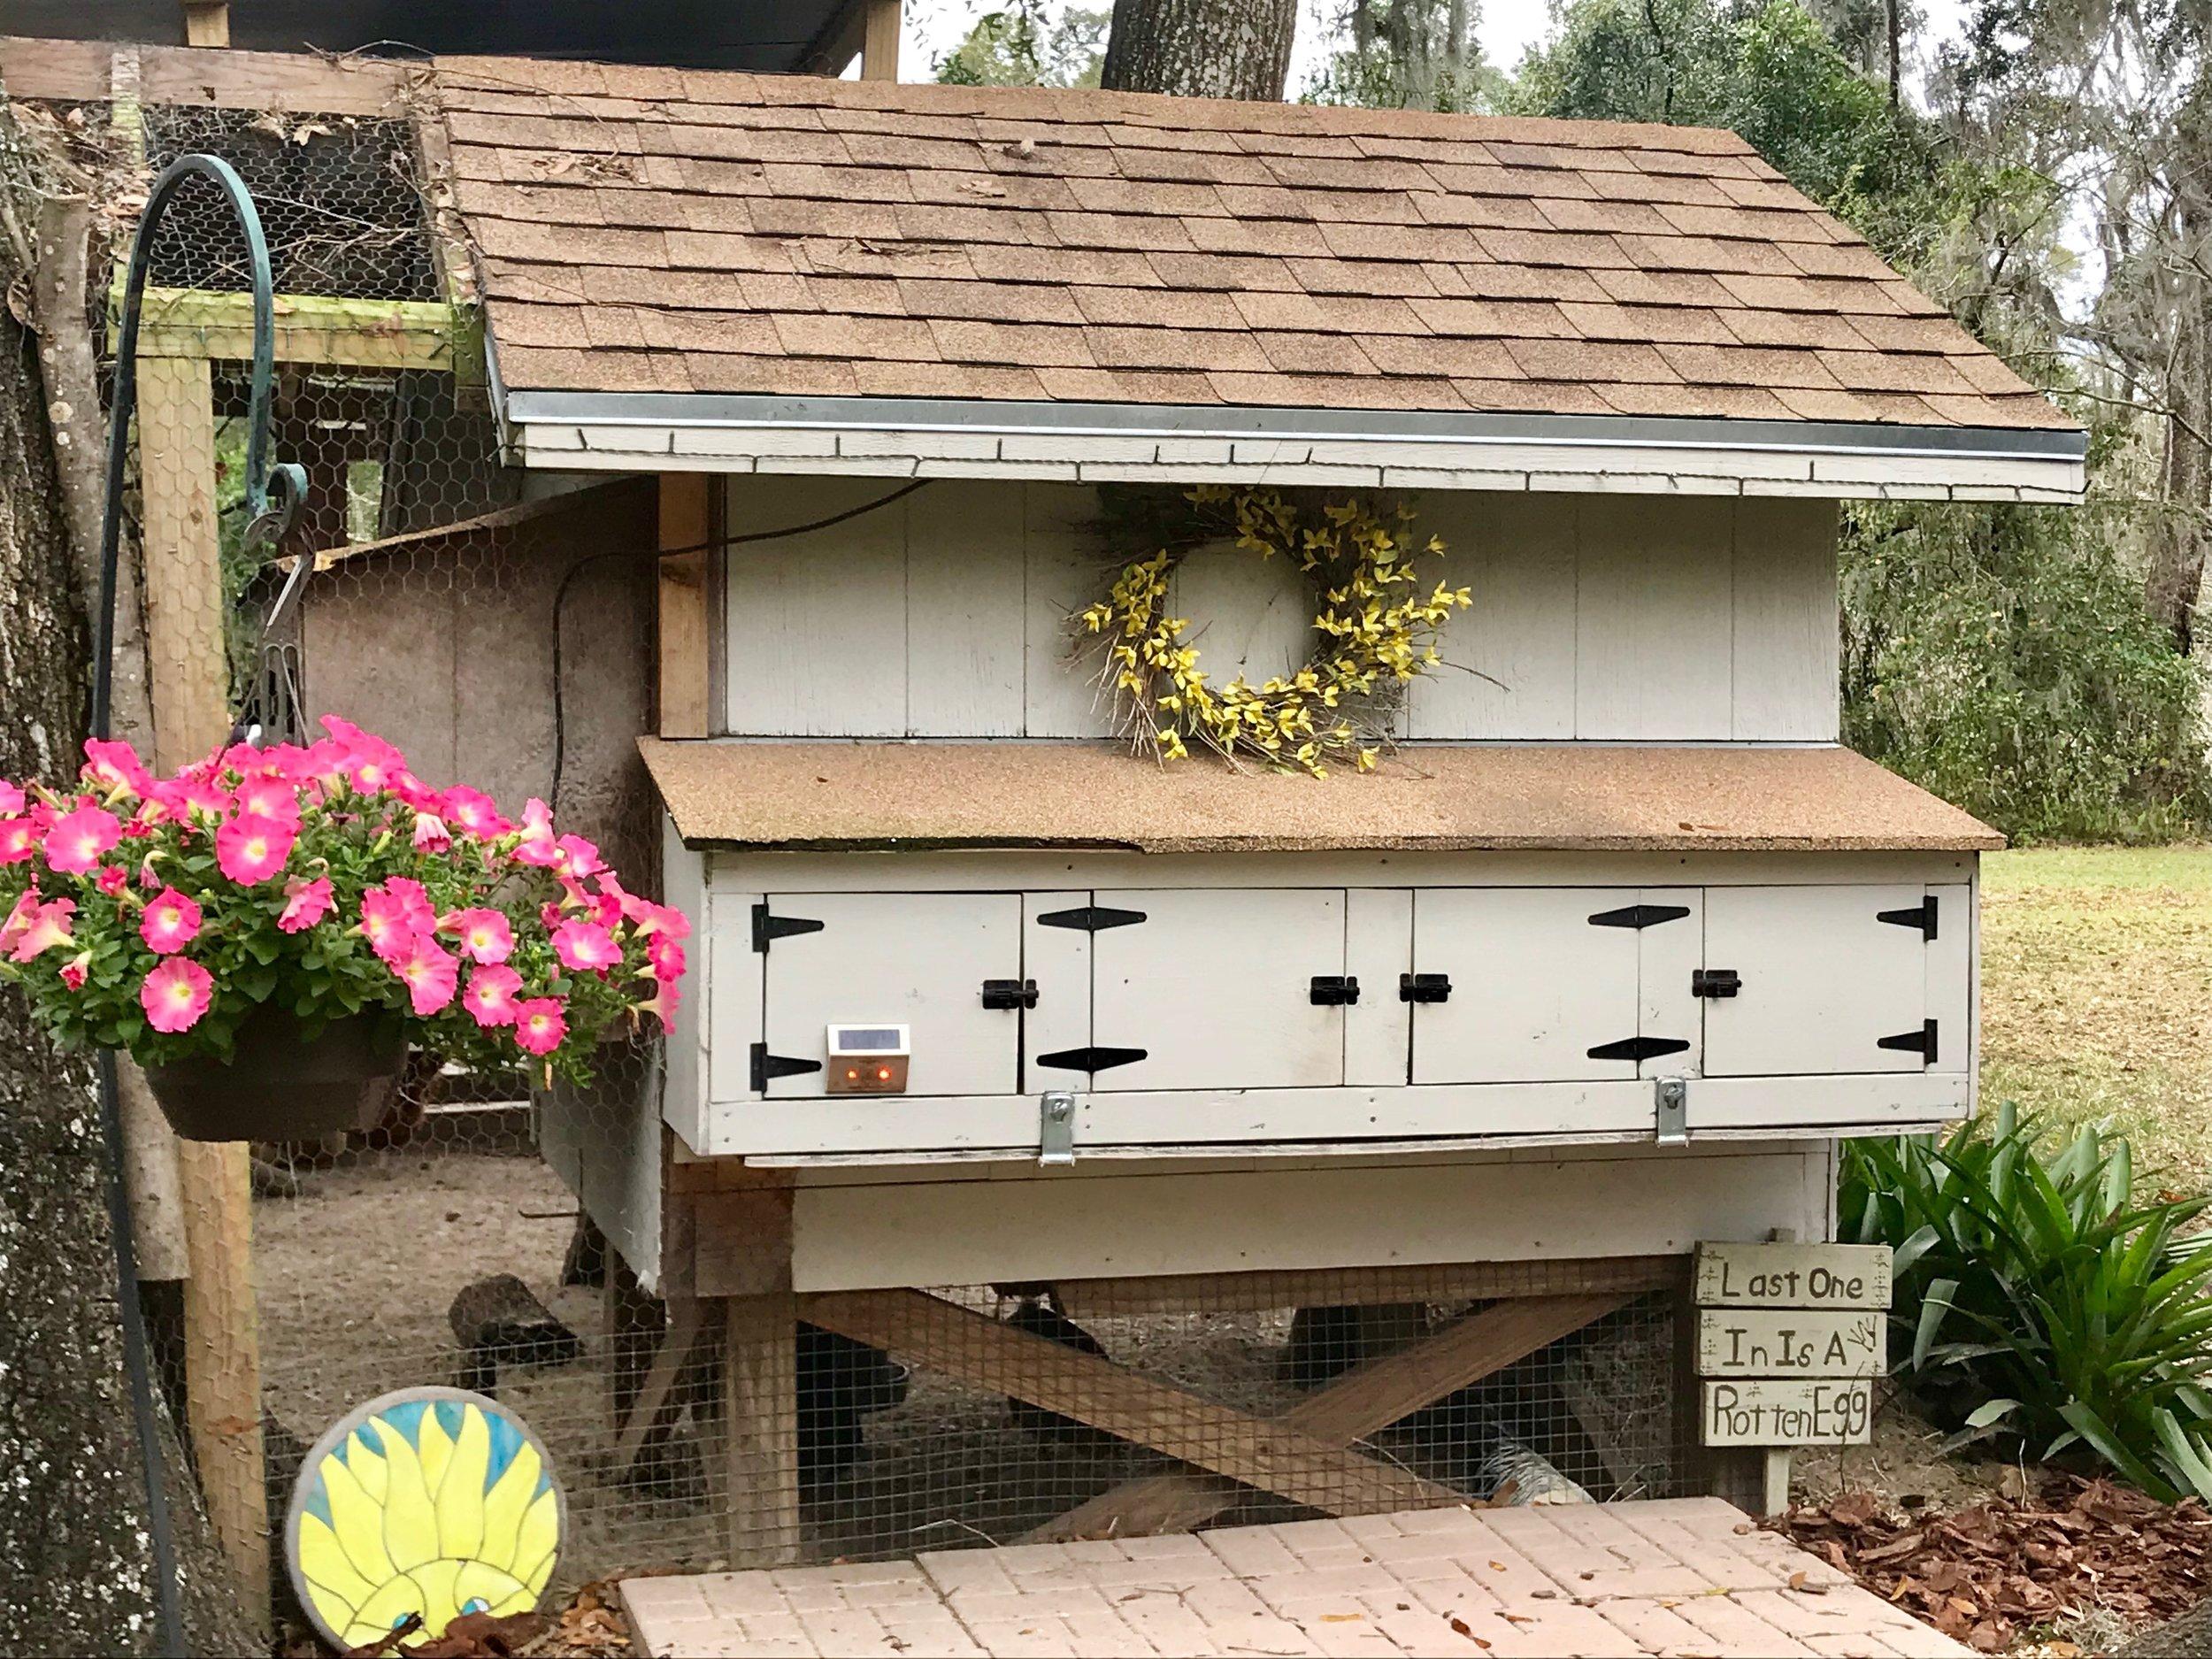 chicken coop nesting boxes.JPG